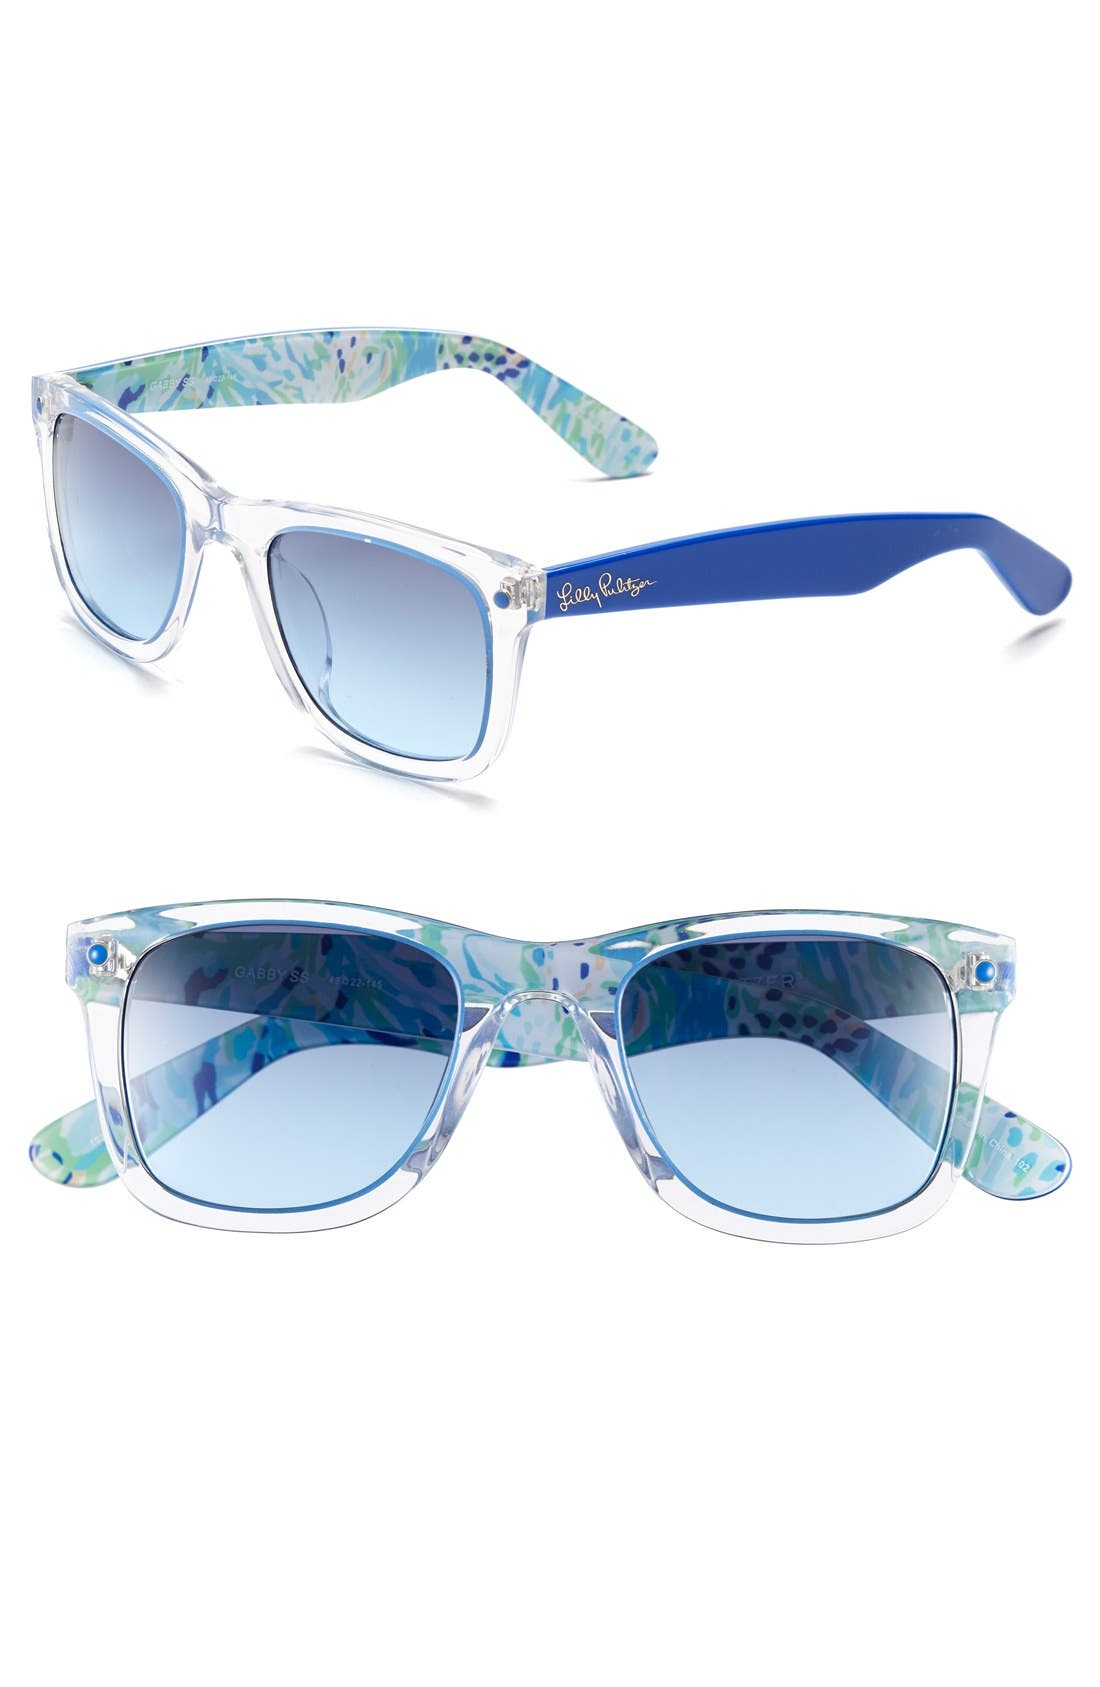 Main Image - Lilly Pulitzer® 'Gabby' 49mm Retro Sunglasses